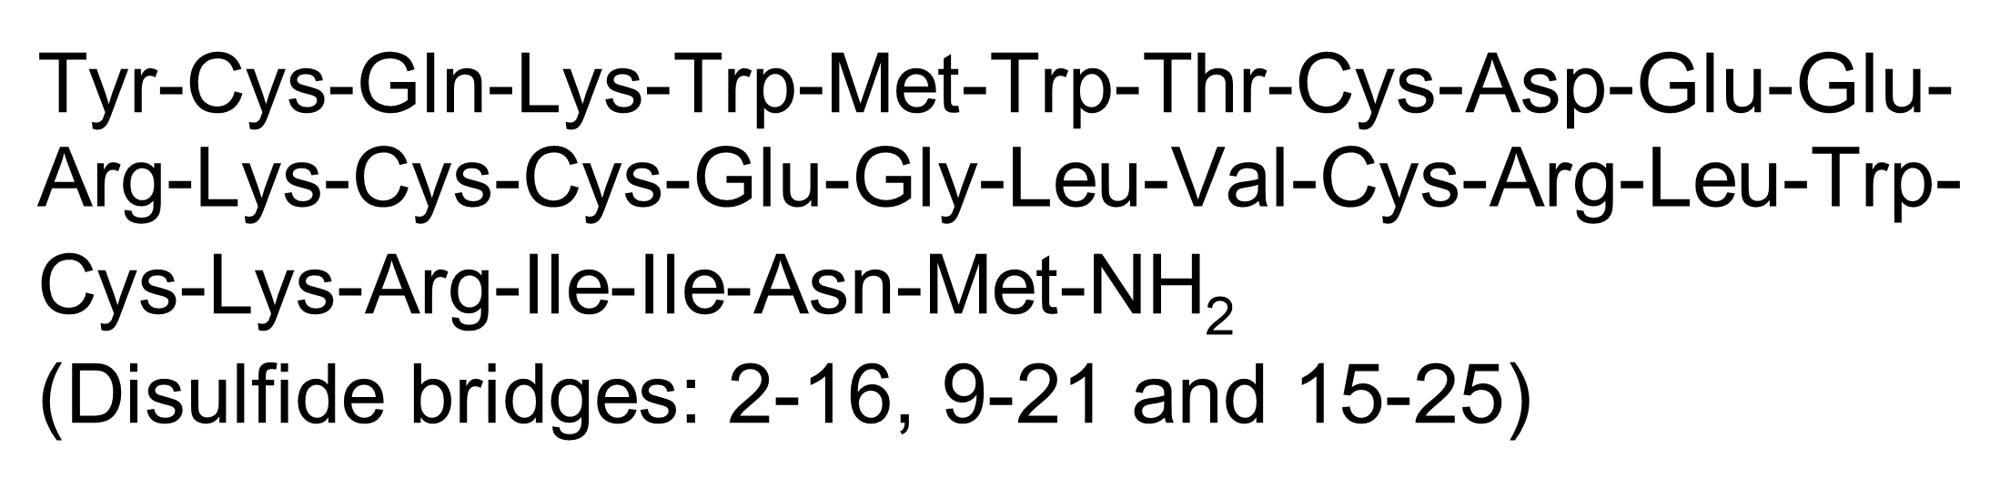 Chemical Structure - Phrixotoxin-2, K<sub>v4.2</sub> and K<sub>v4.3</sub> channel blocker (ab141843)